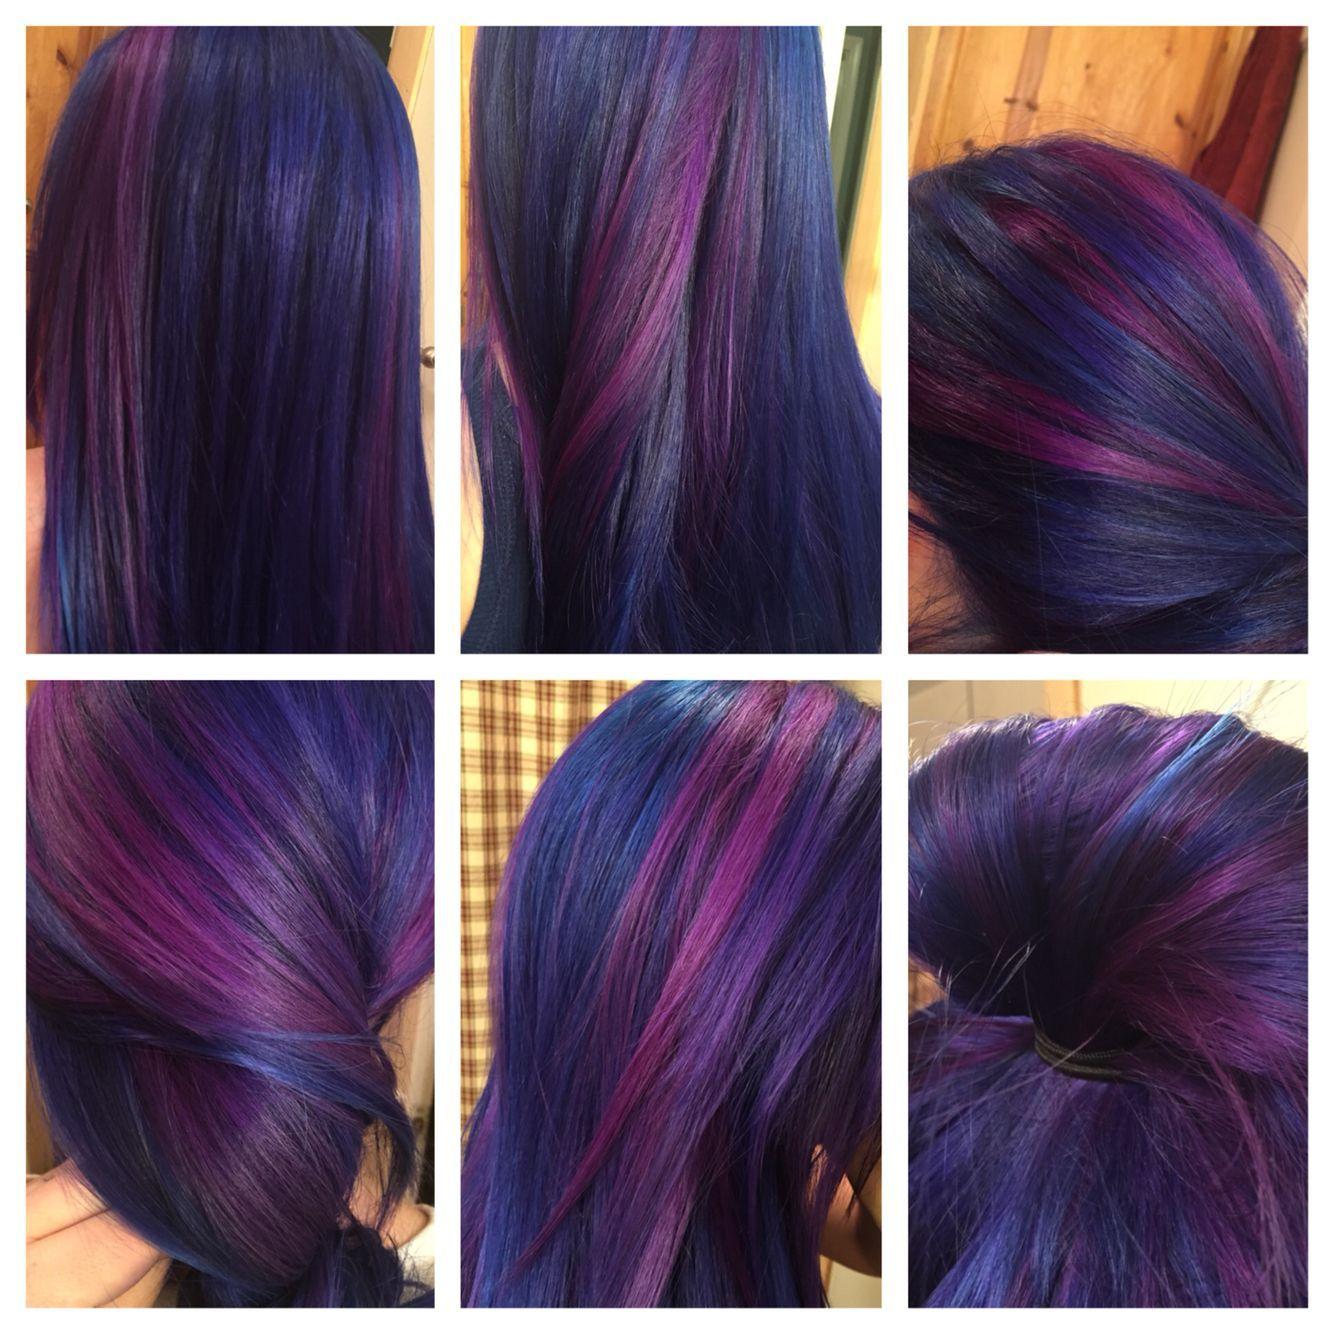 Pin By Mary Fenderson On Hair Style In 2020 Hair Color Plum Plum Hair Hair Styles